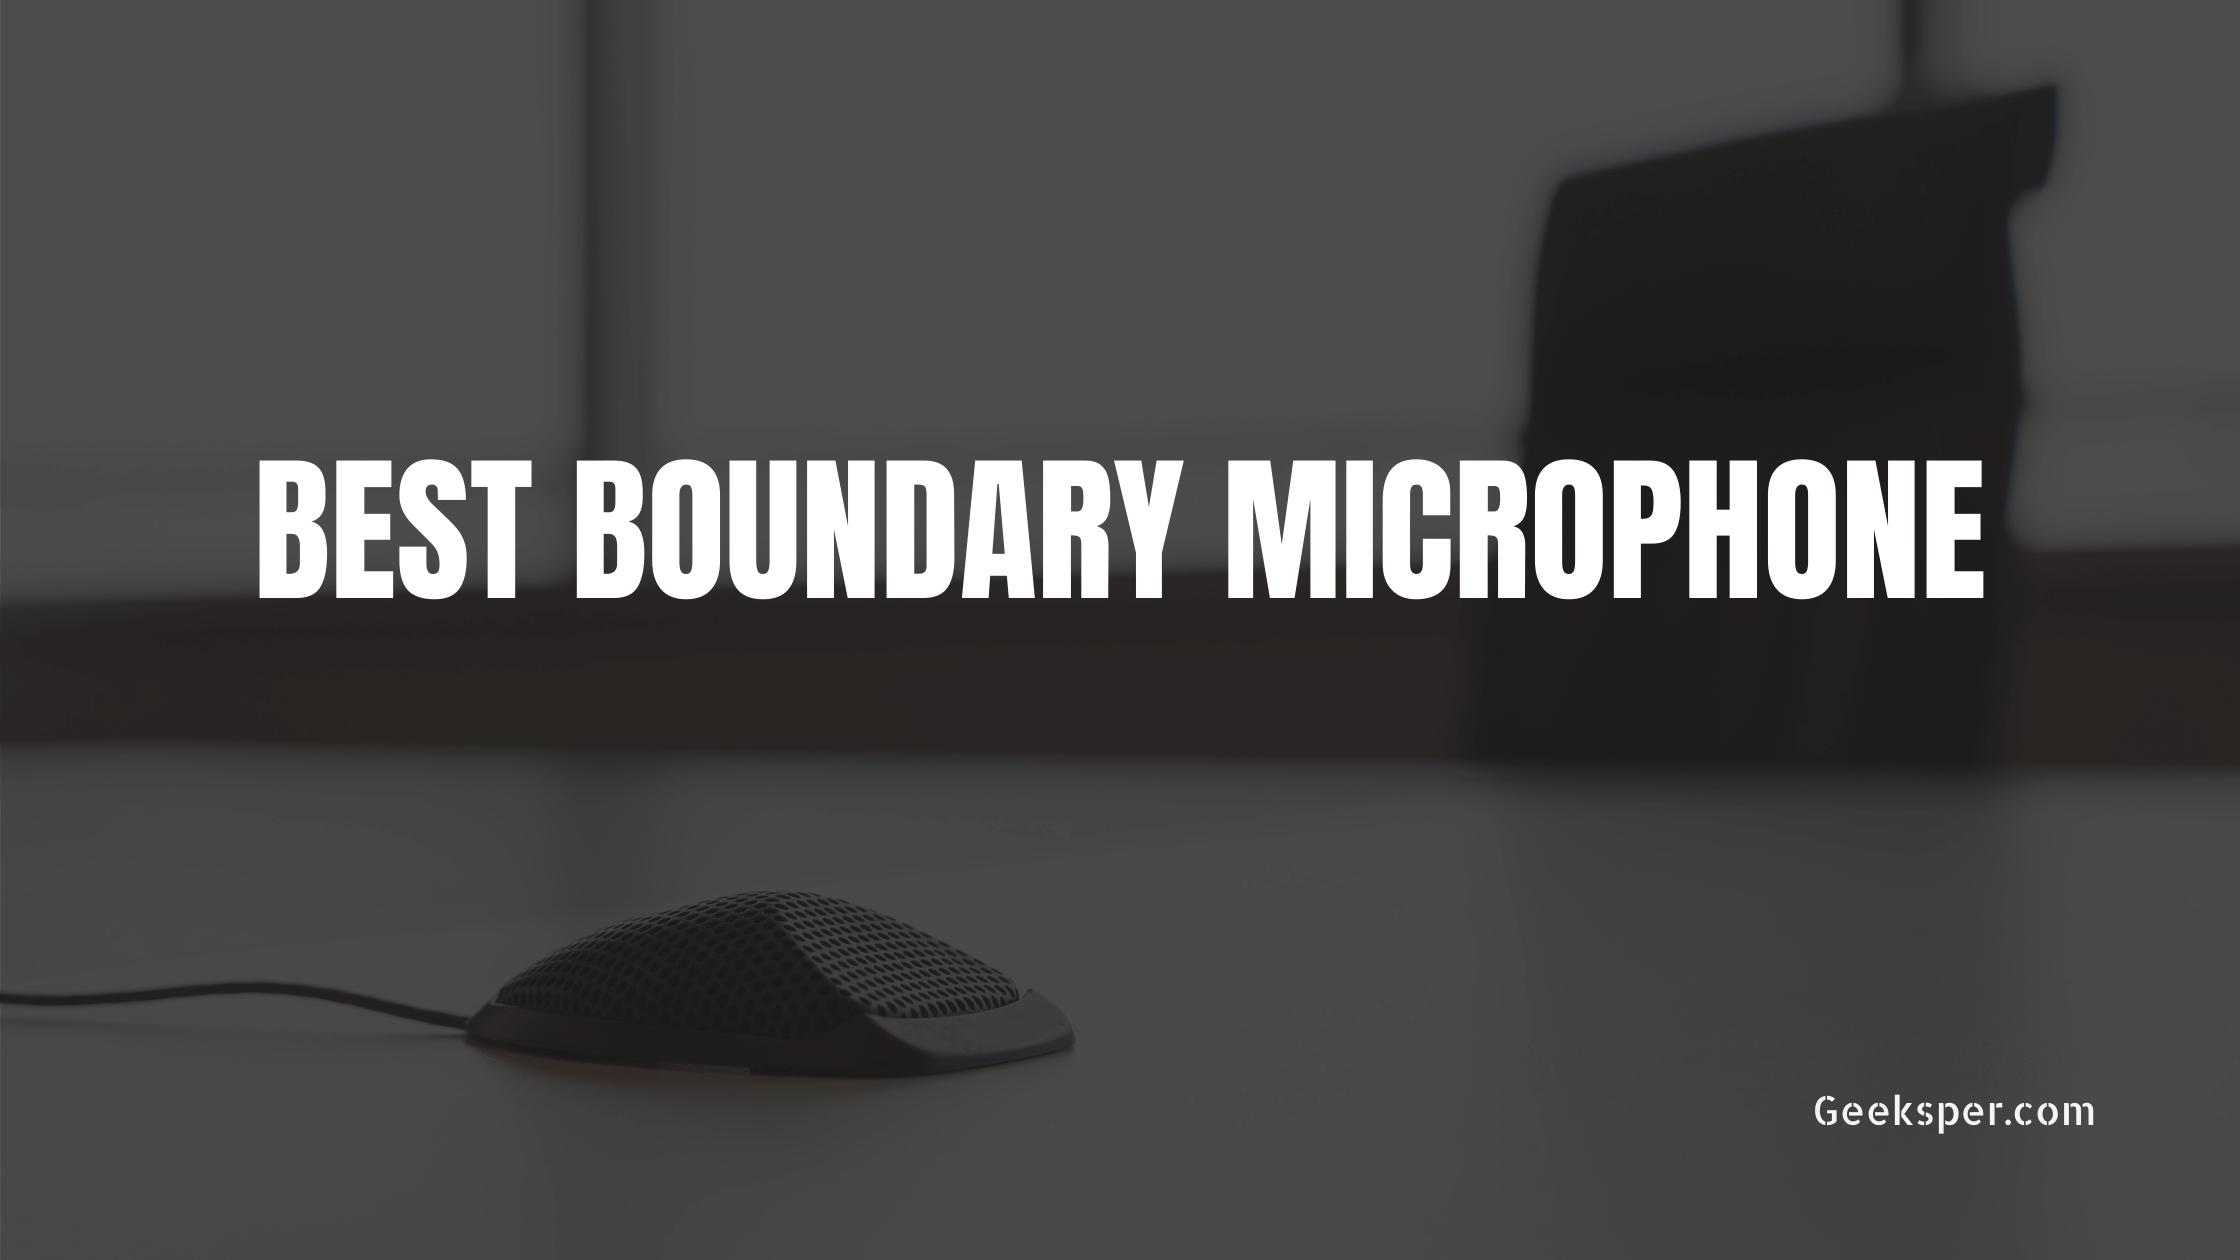 Best Boundary Microphone